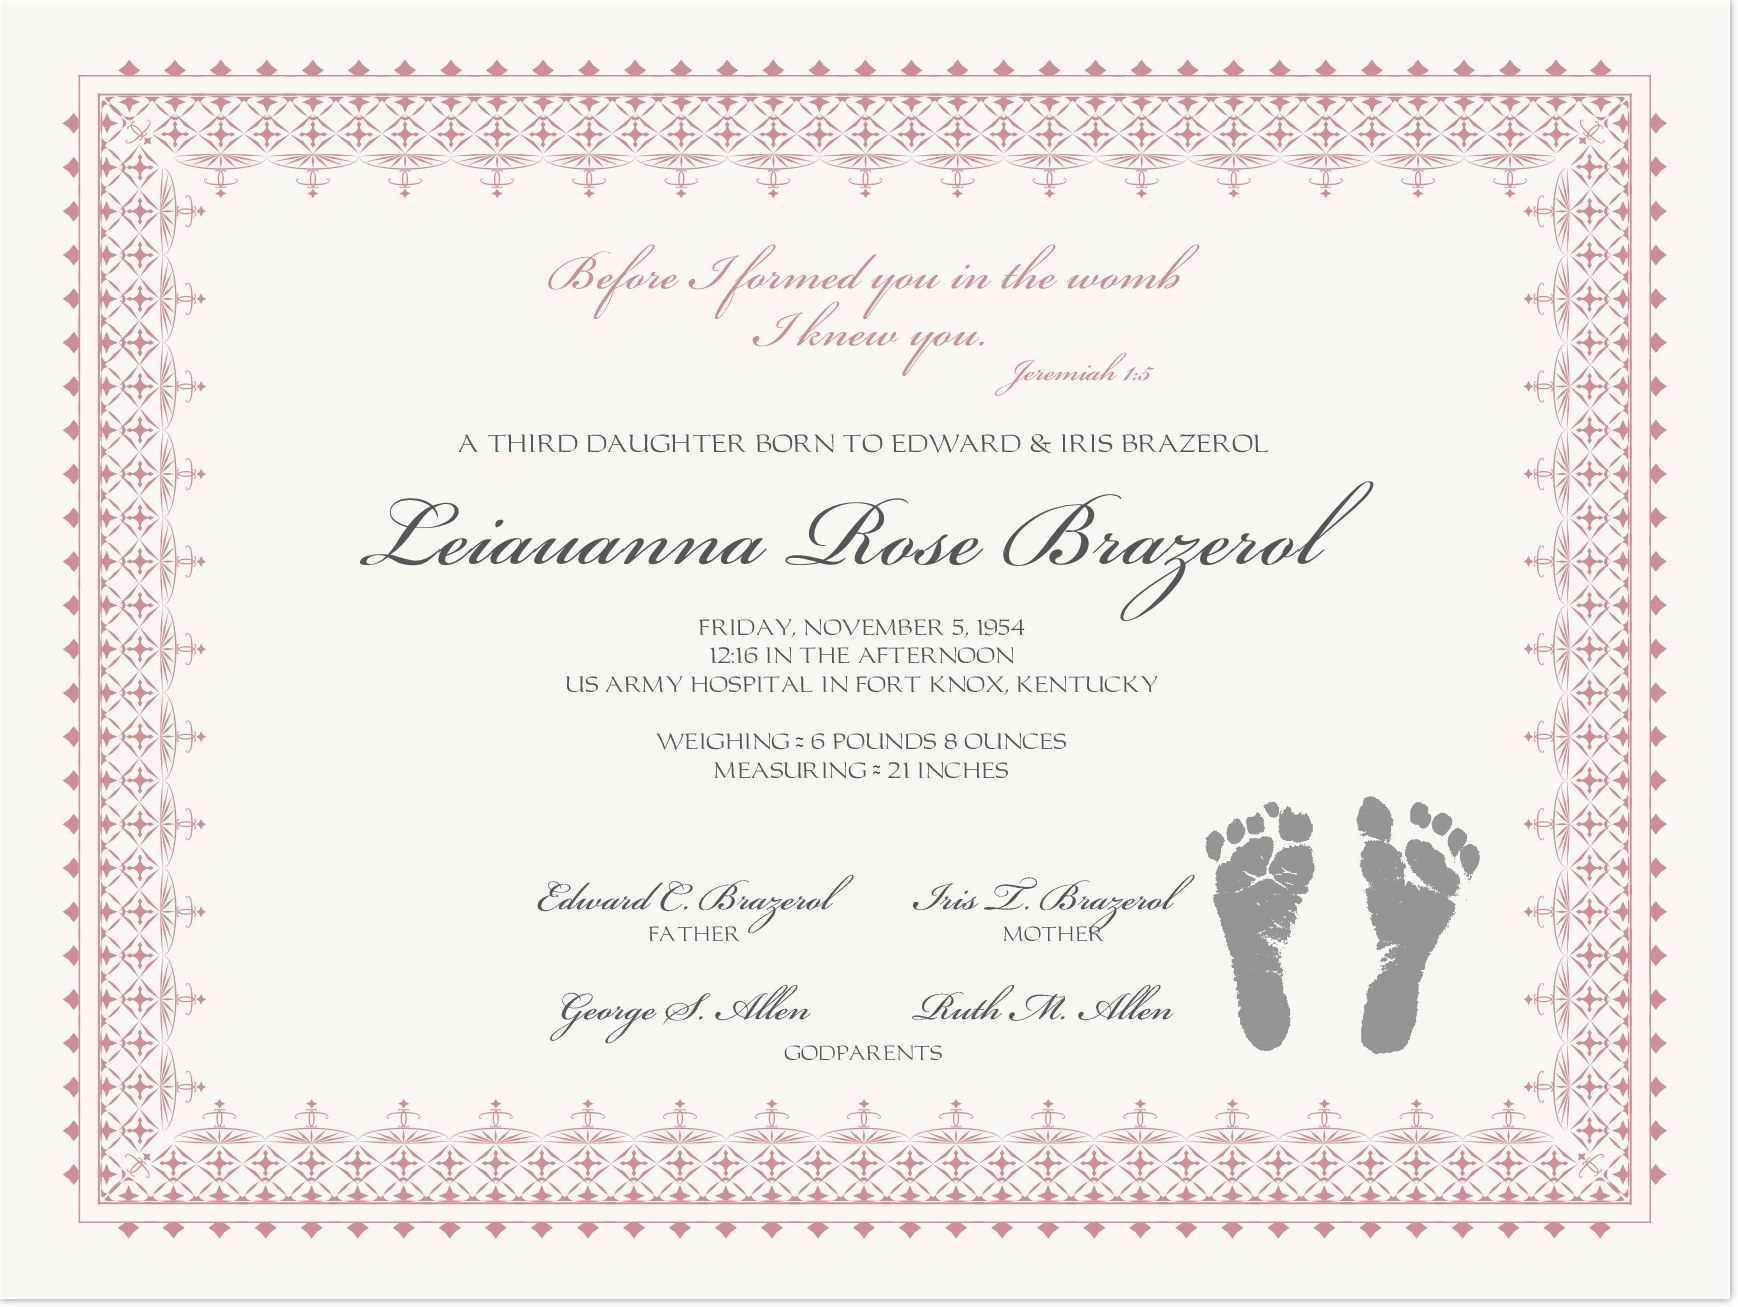 Footprints Baby Certificates | Birth Certificate Template In Baby Christening Certificate Template